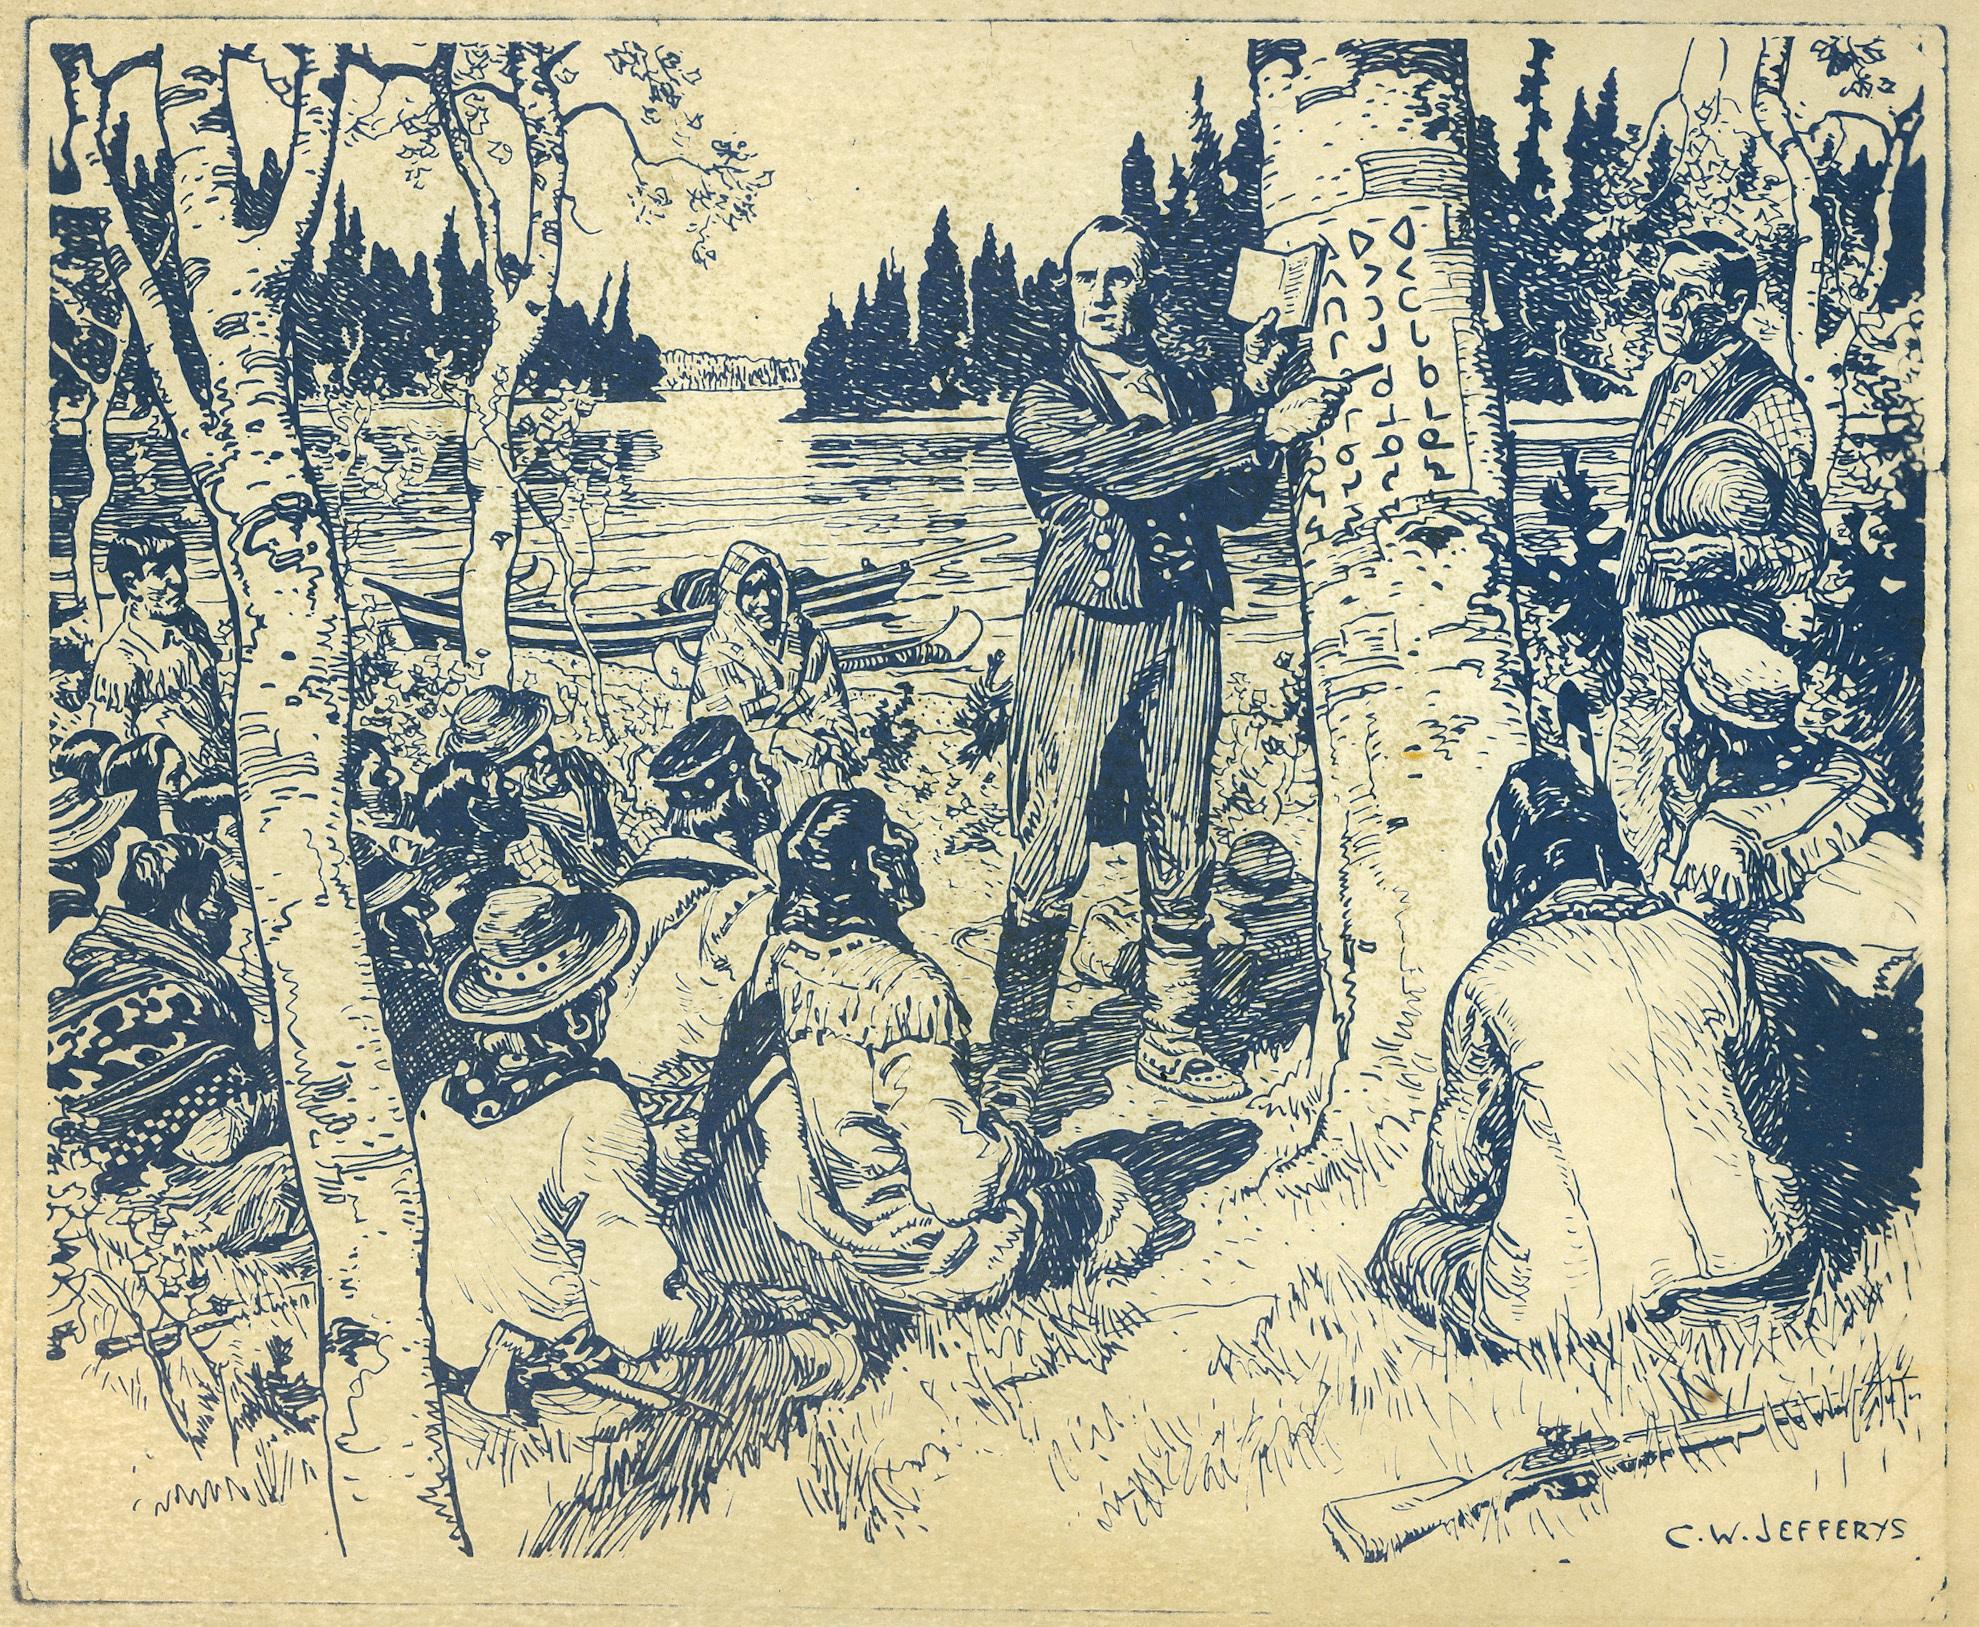 James Evans teaching Cree syllabics to a group. C.W. Jefferys, 1934. Victoria University Library (Toronto).